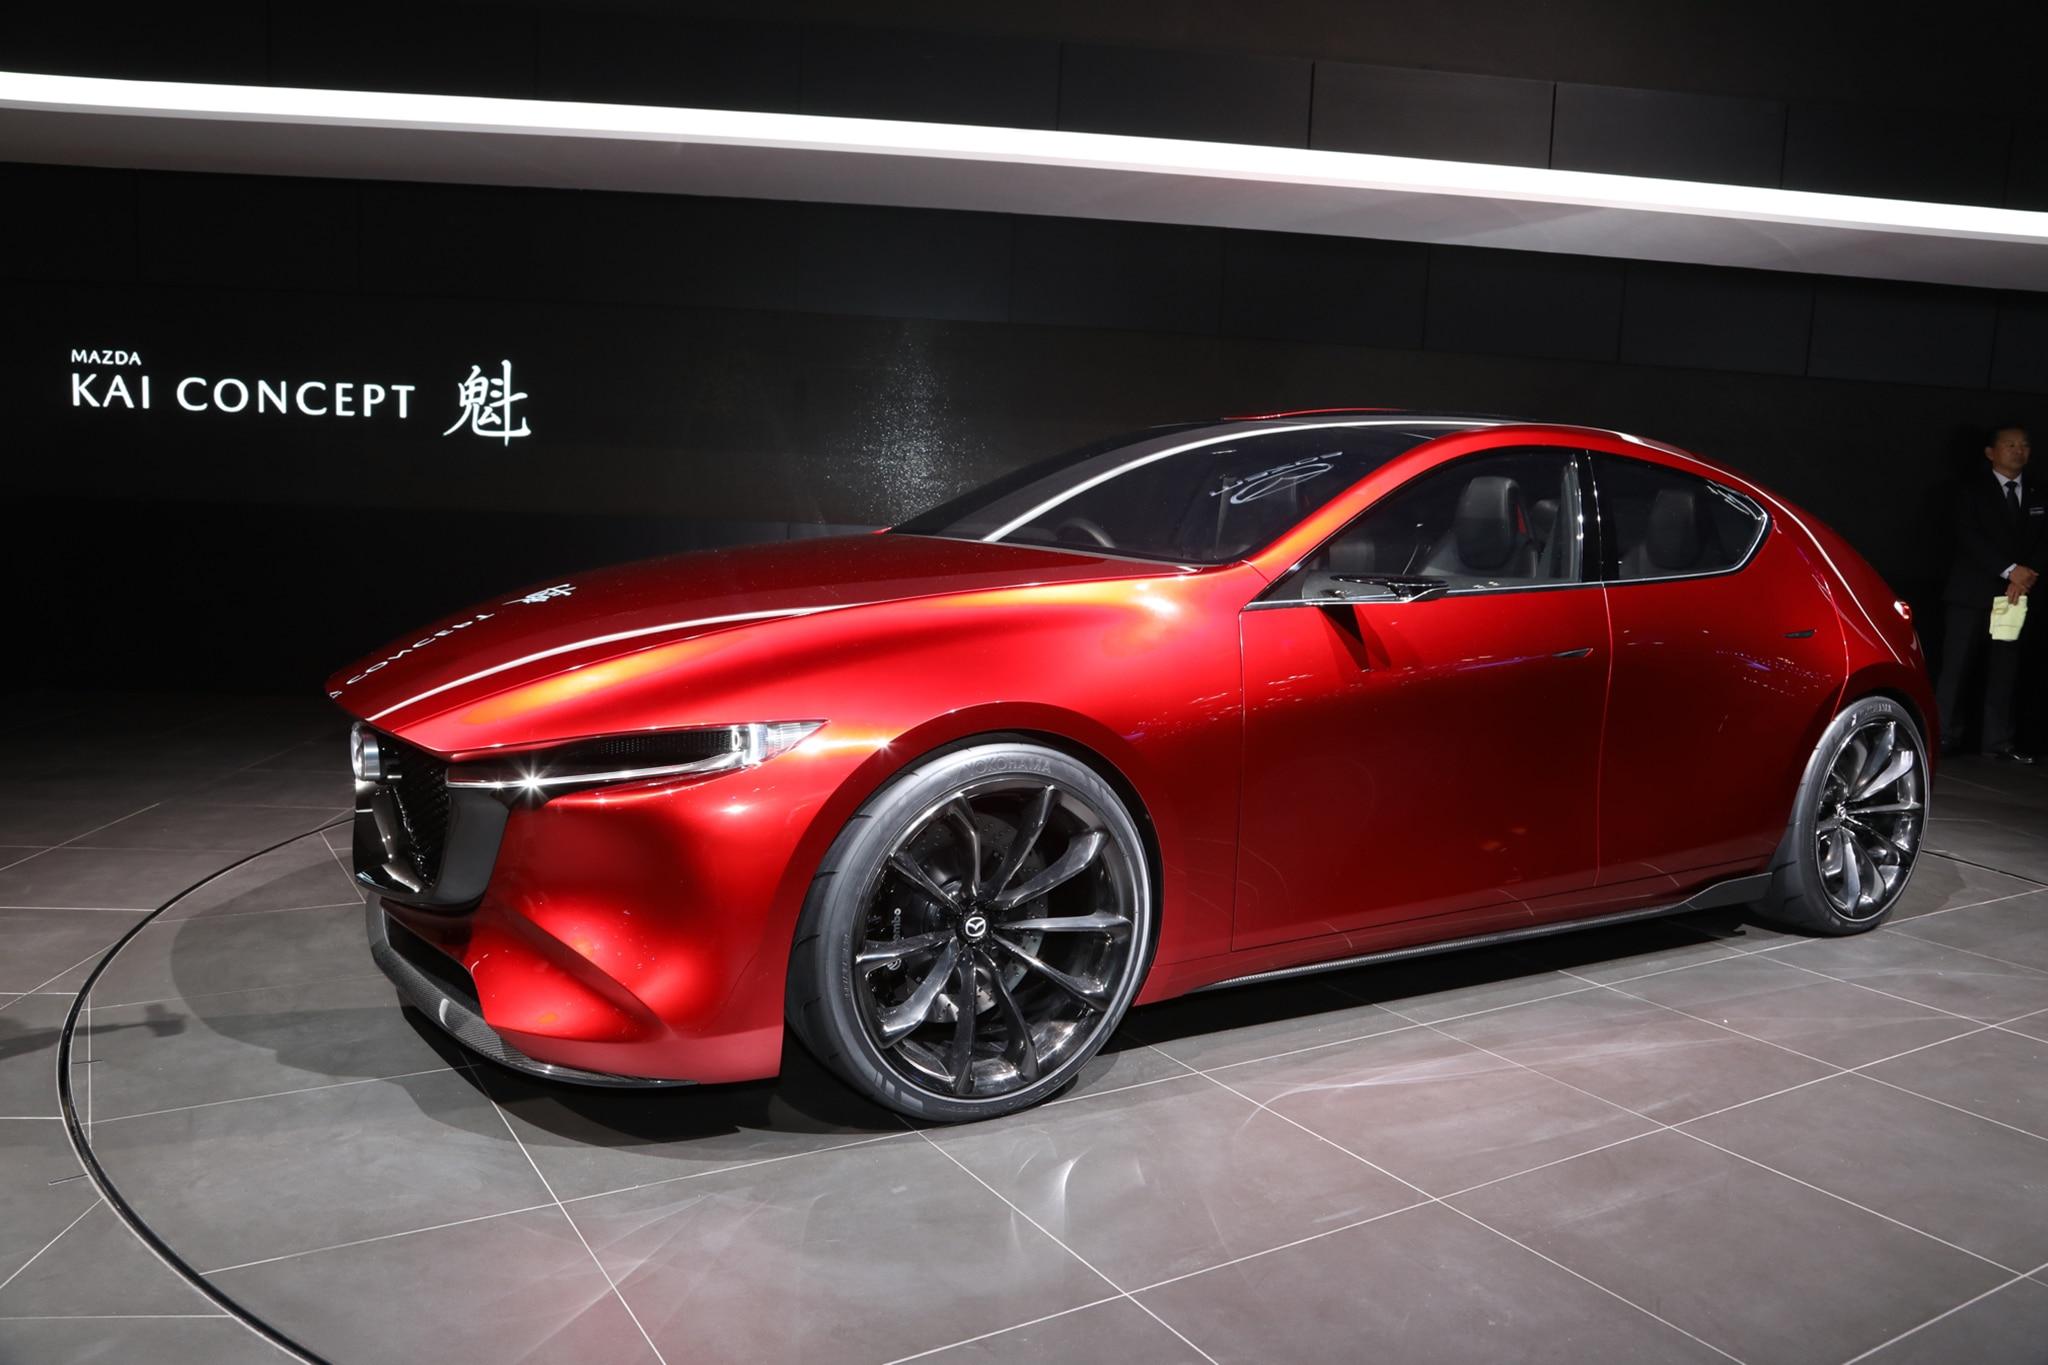 Mazda Kai Concept Front Three Quarter 02